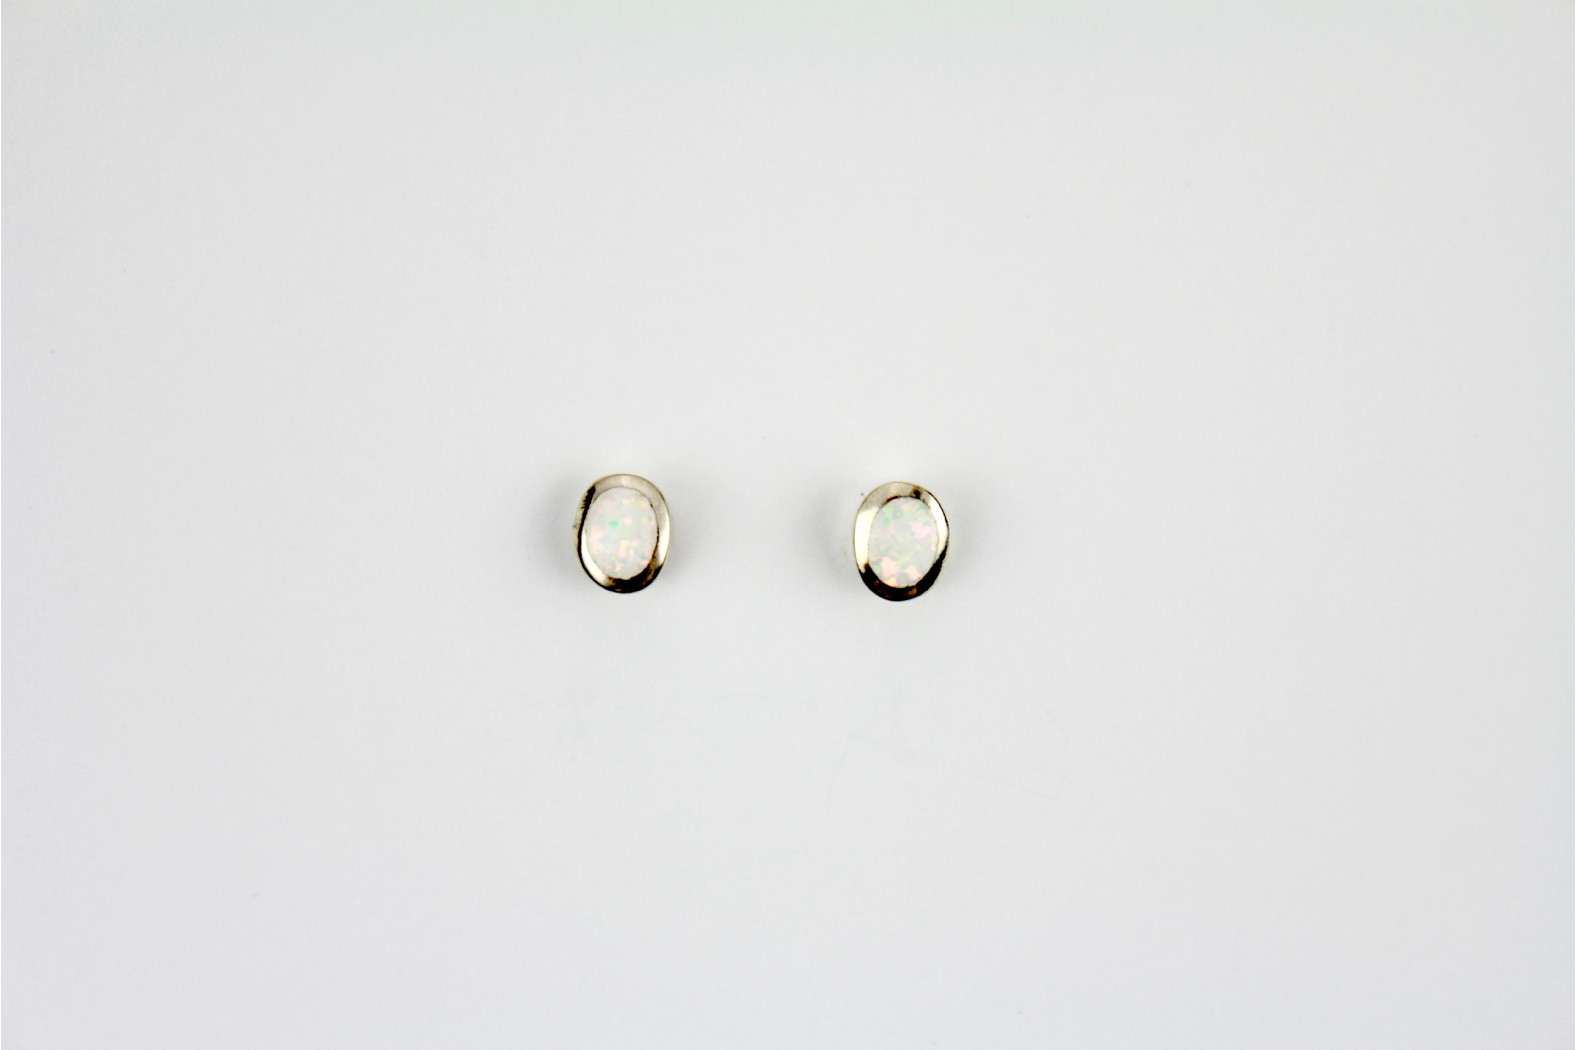 White Opal Fire oval silver edge created stud earrings